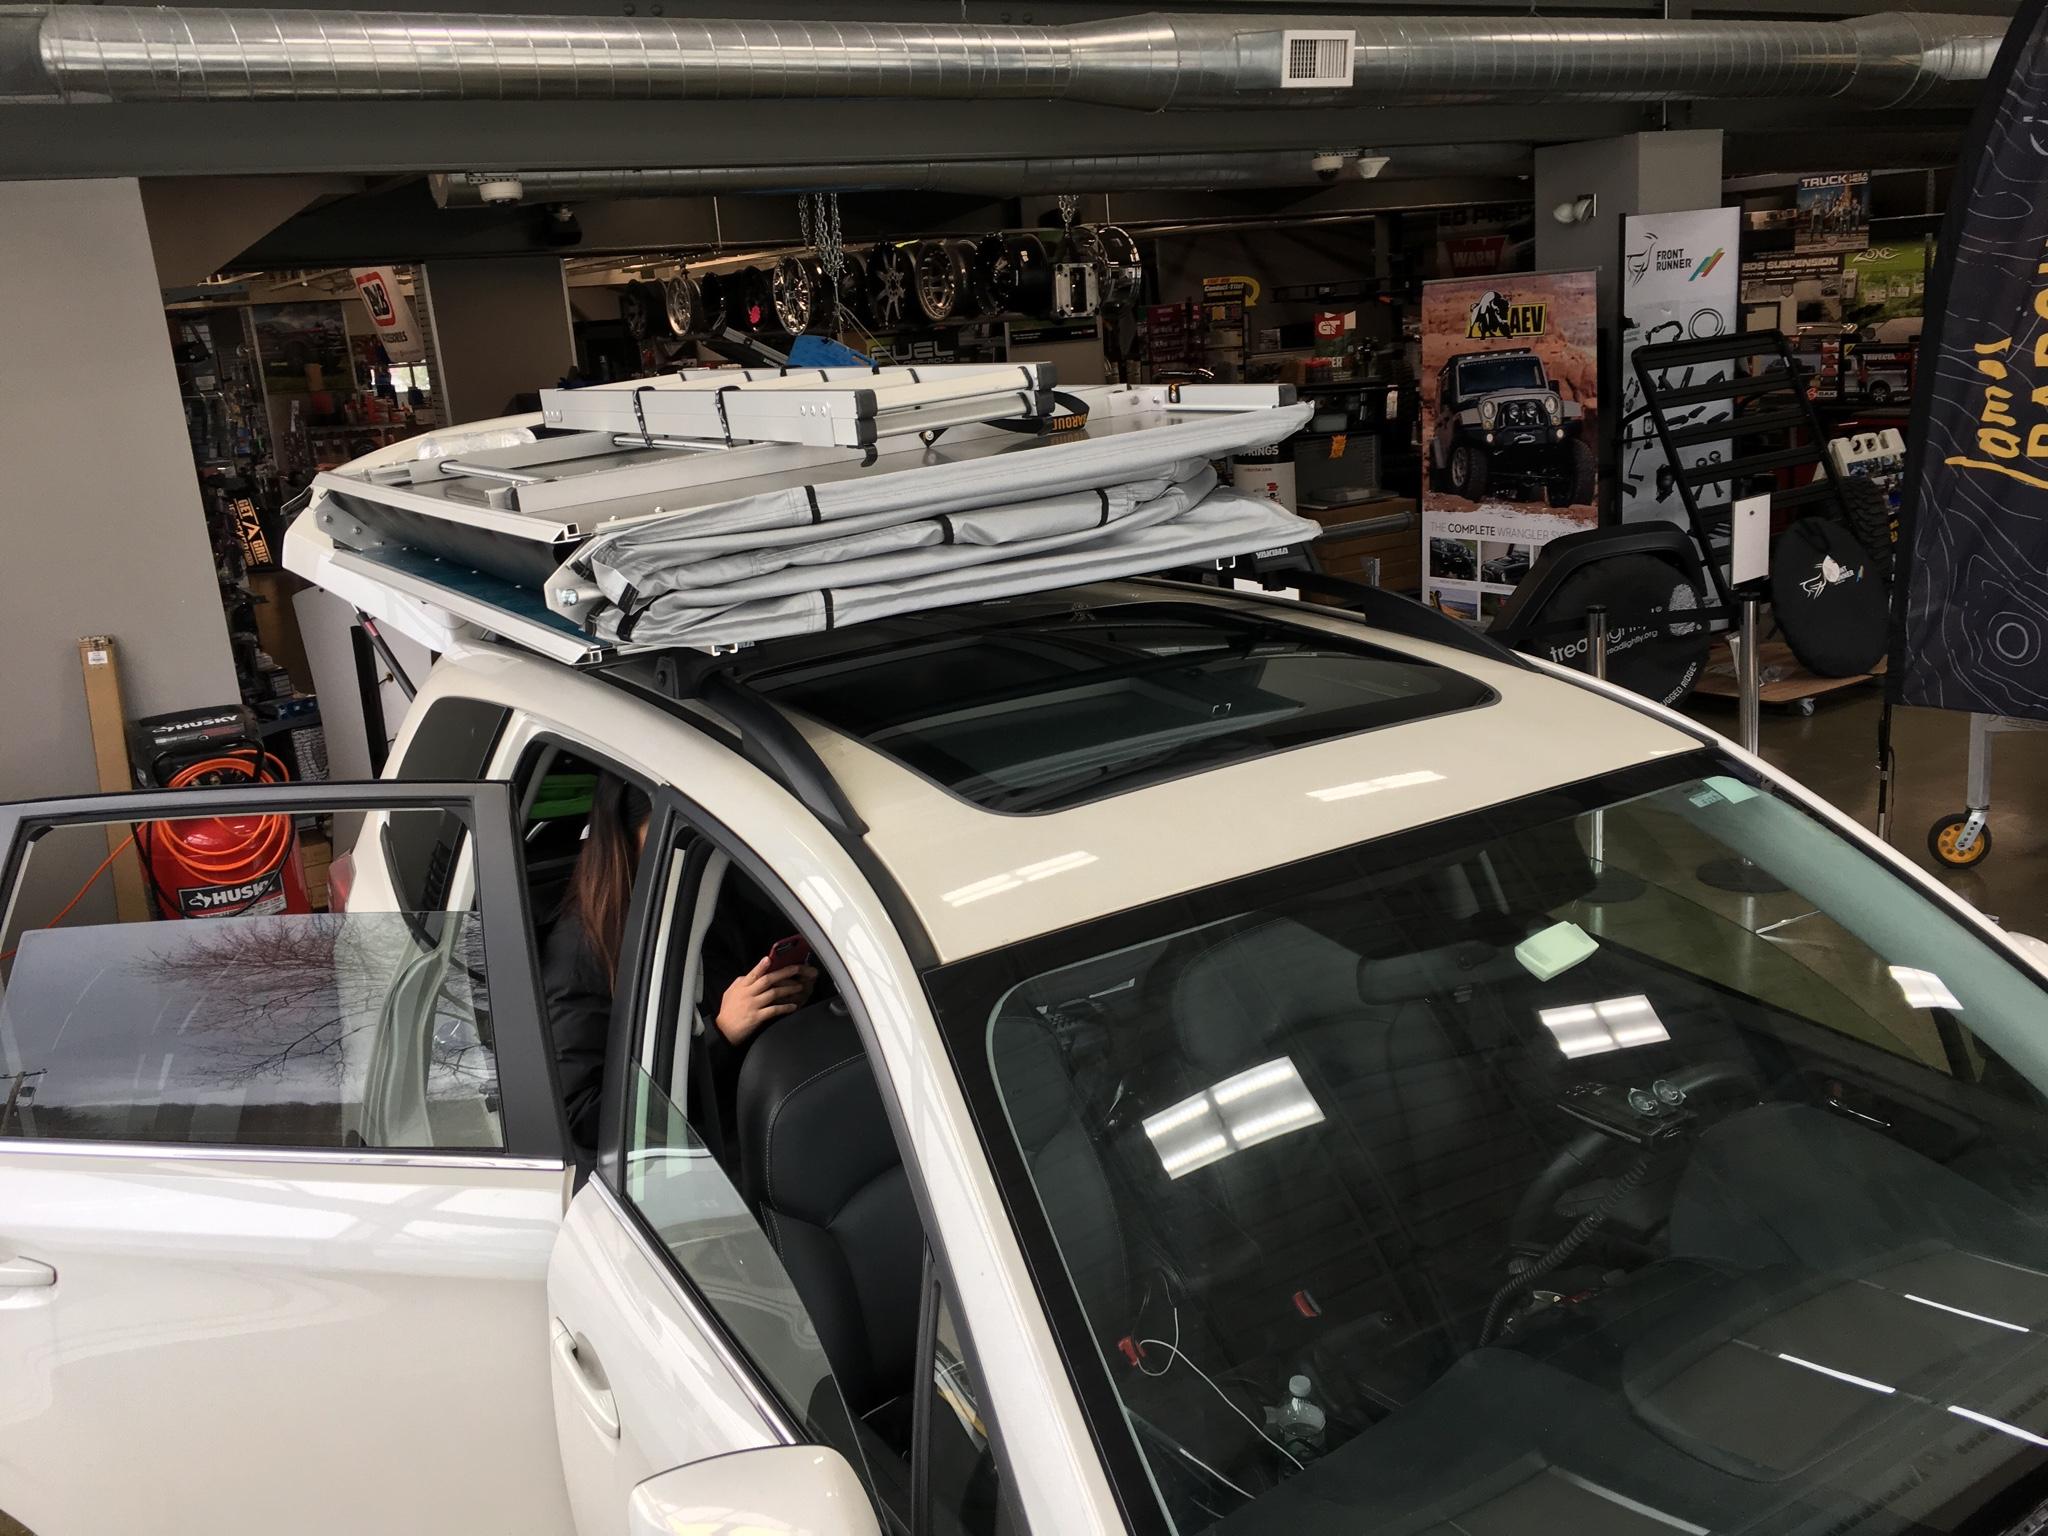 14 18 James Baroud Roof Top Tent Subaru Forester